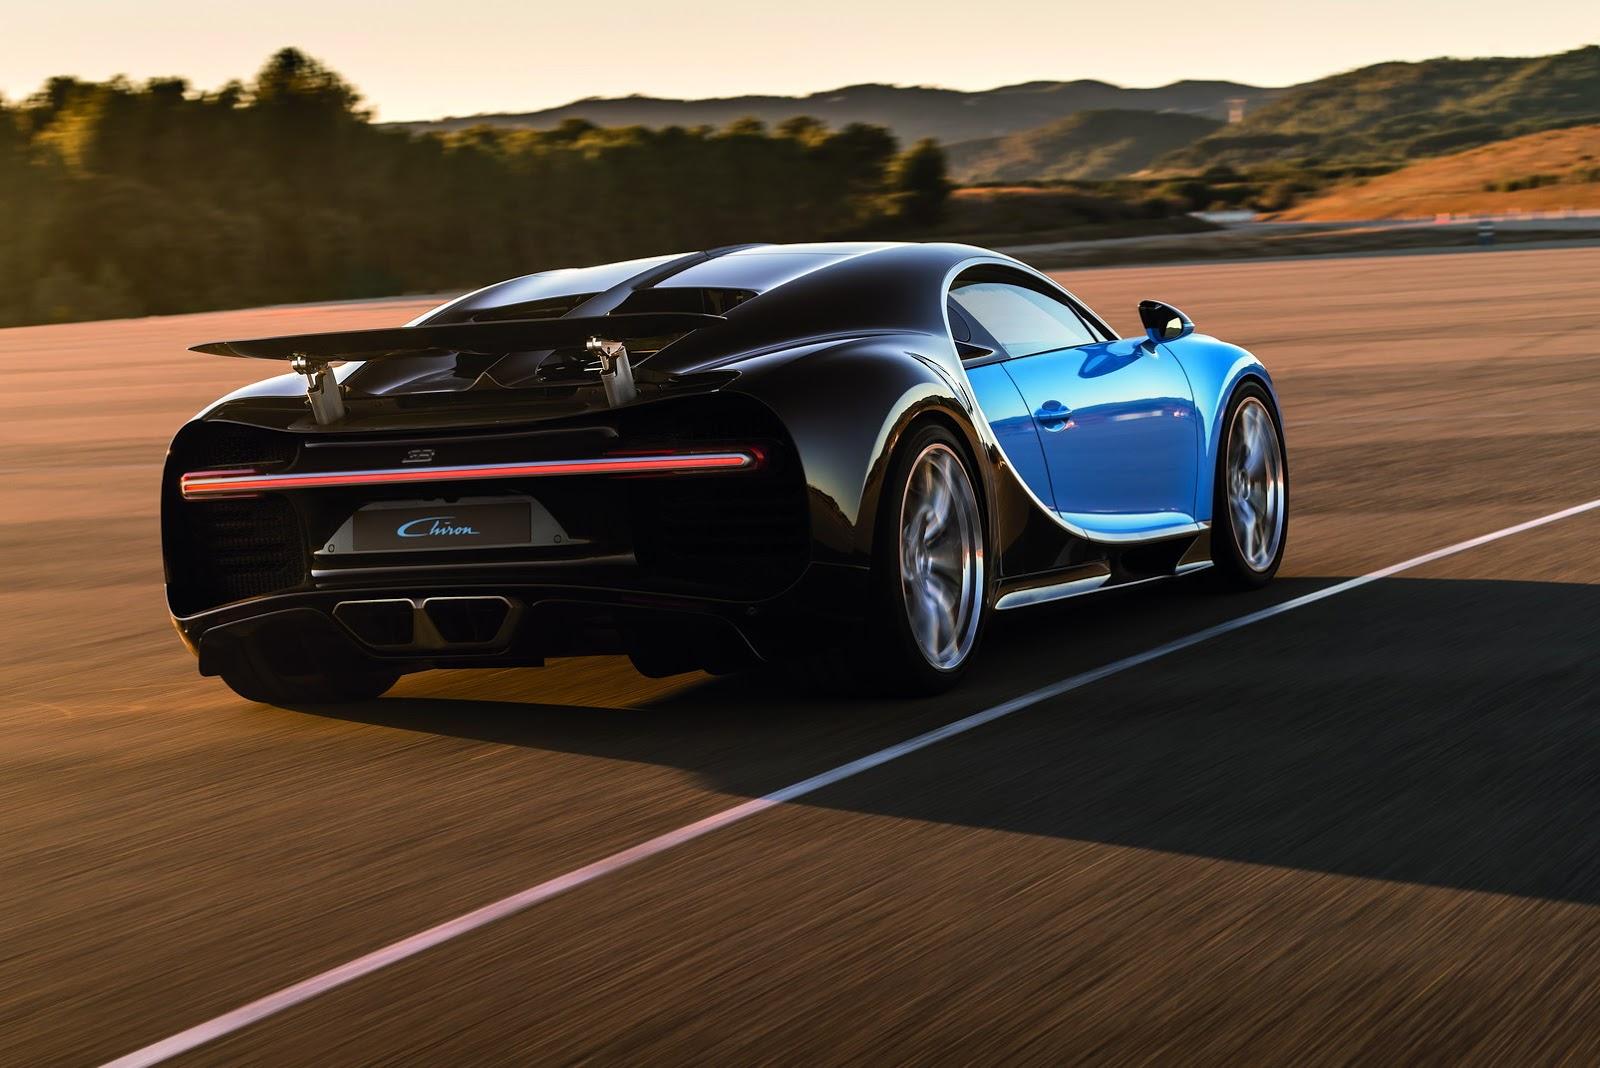 Bugatti Test Driver Suggests The Chiron Won't Hit 300 MPH ...